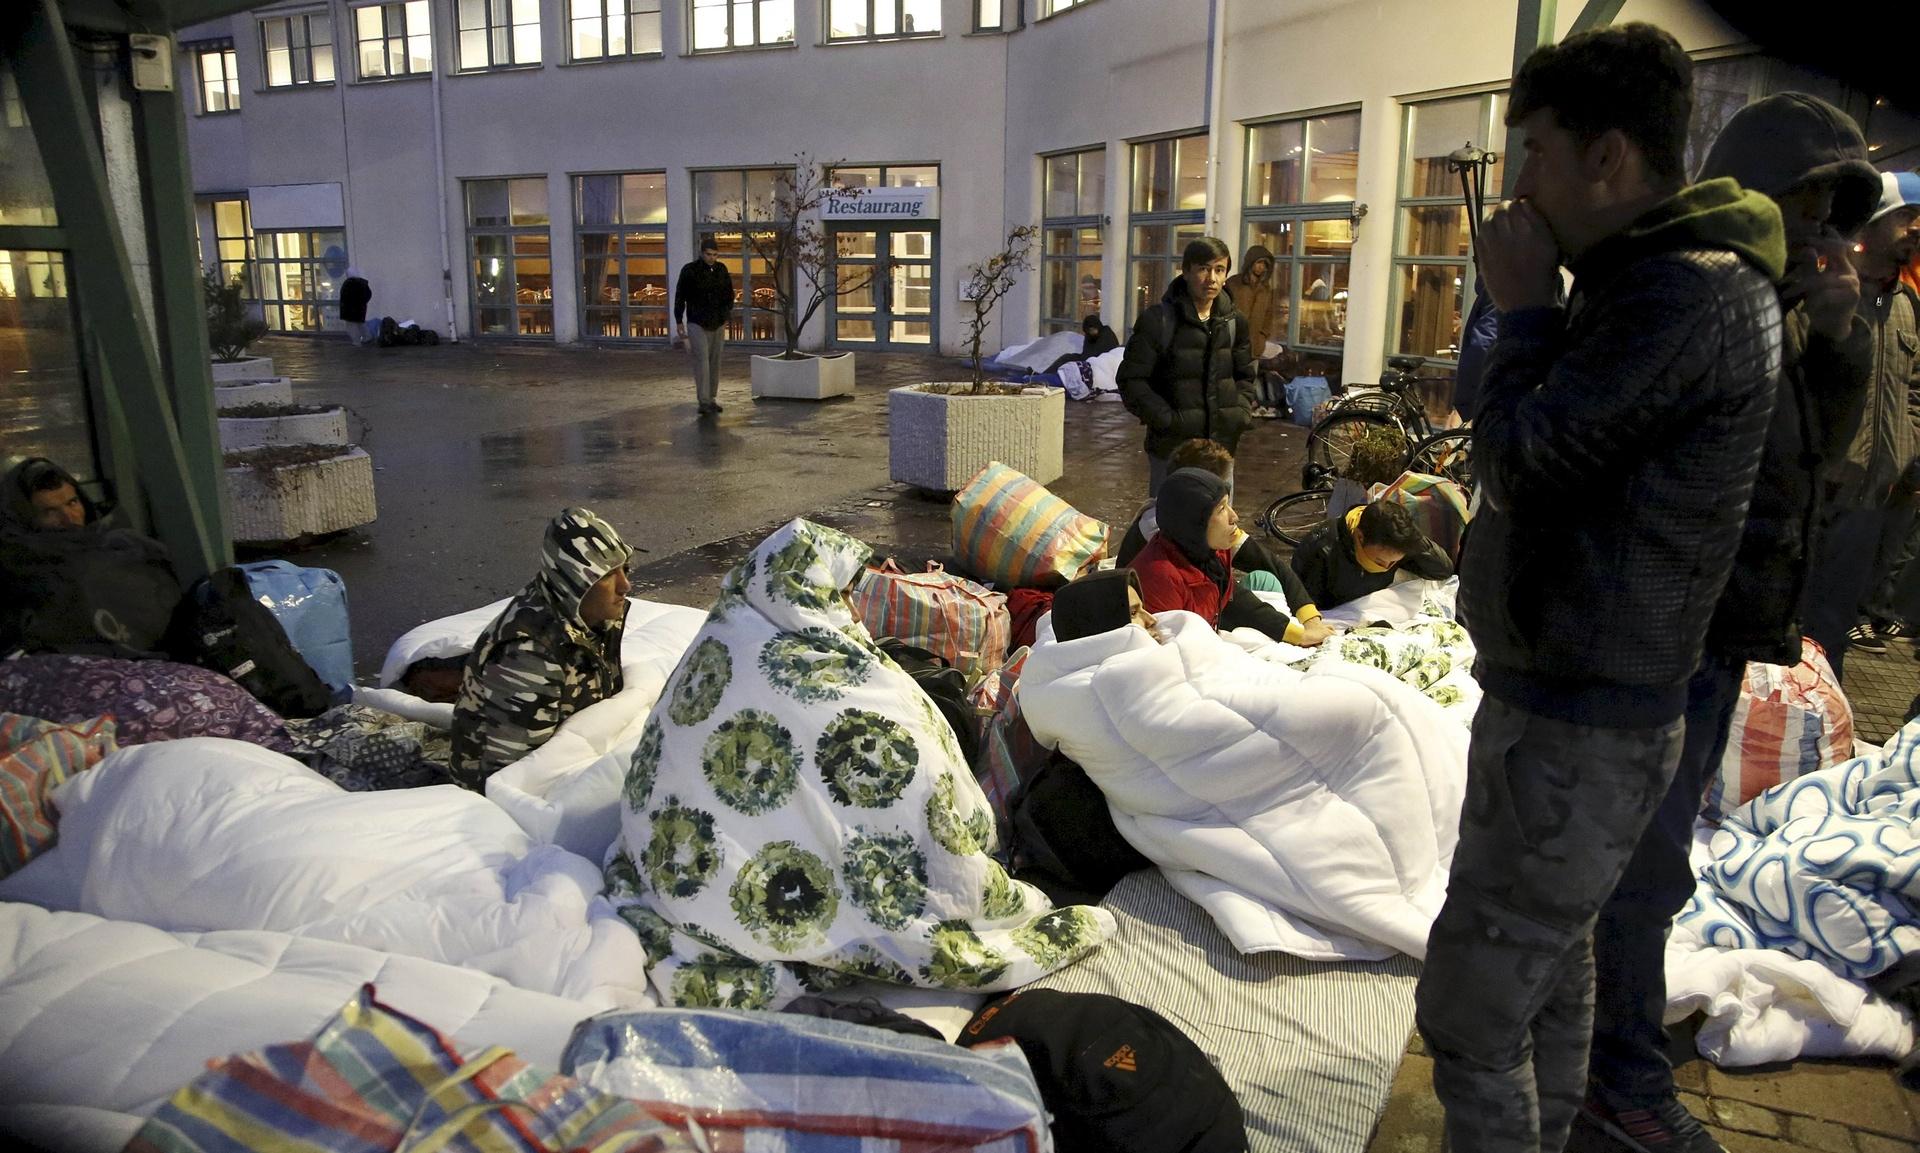 Sweden May Deport Thousands of Asylum Seekers